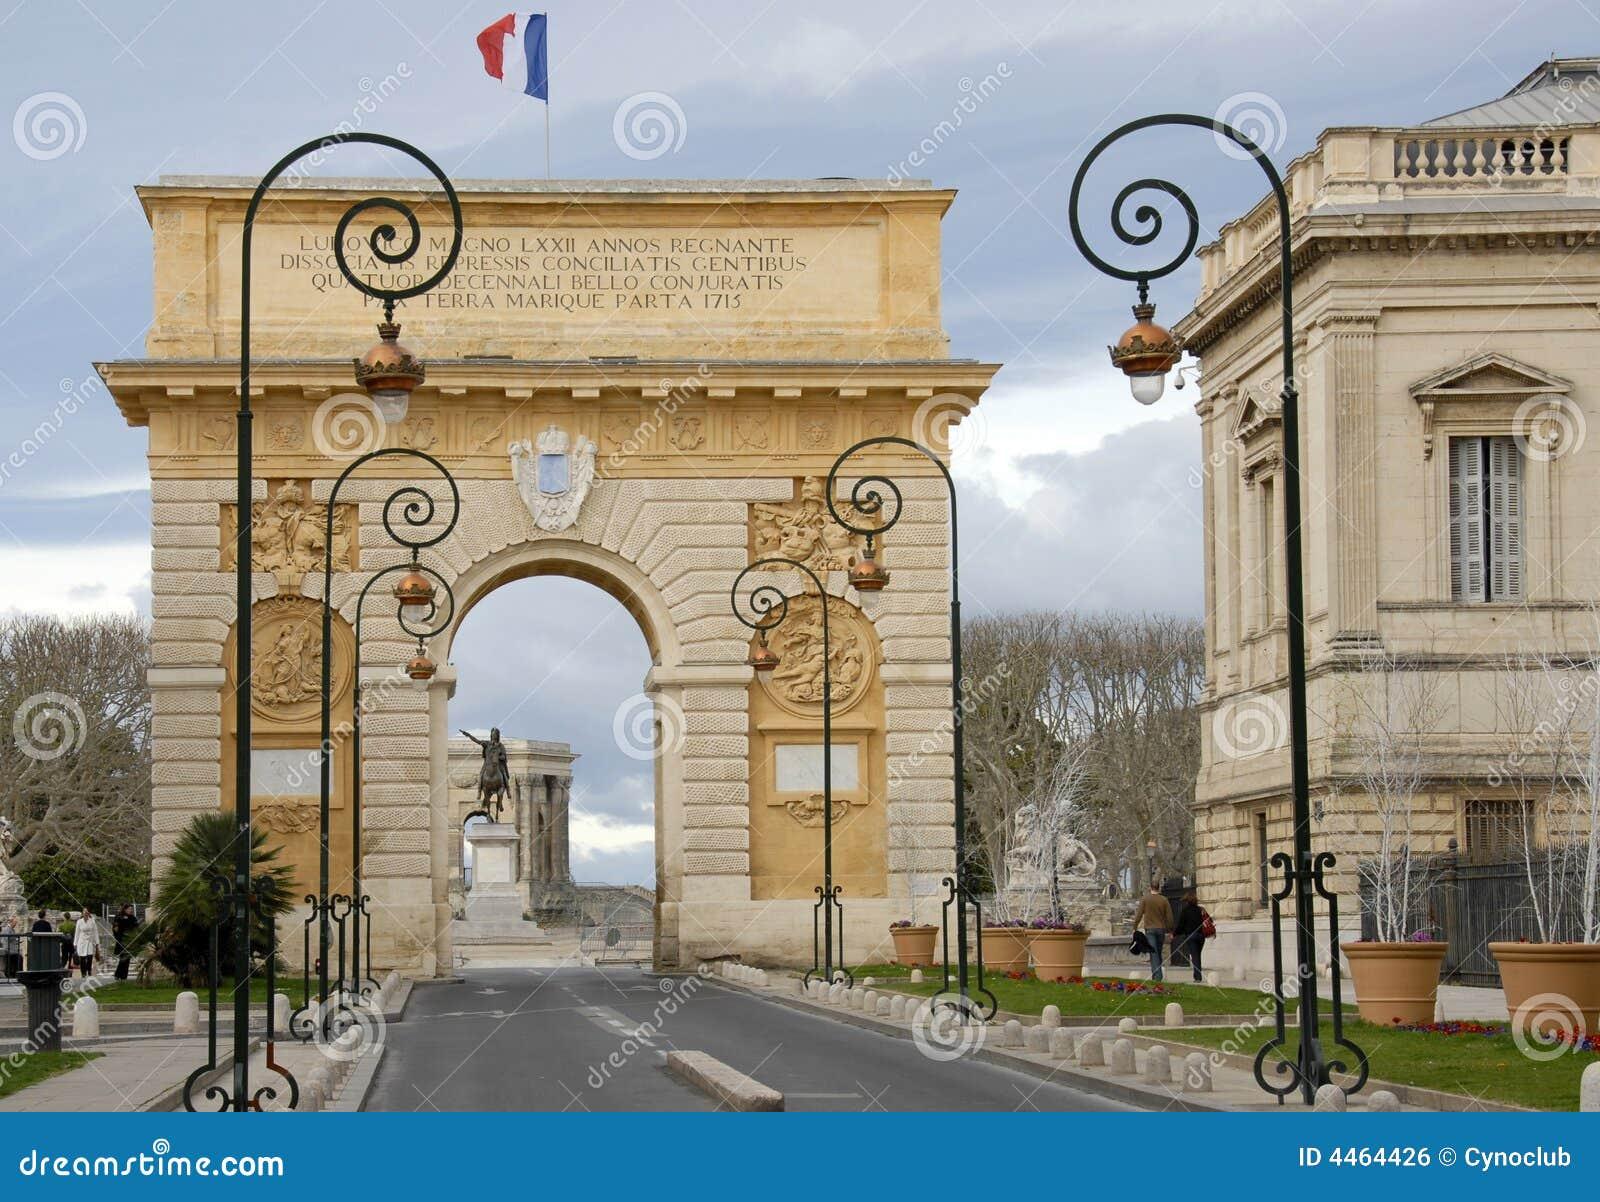 Arc de triomphe montpellier royalty free stock image image 4464426 - Arc de triomphe montpellier ...